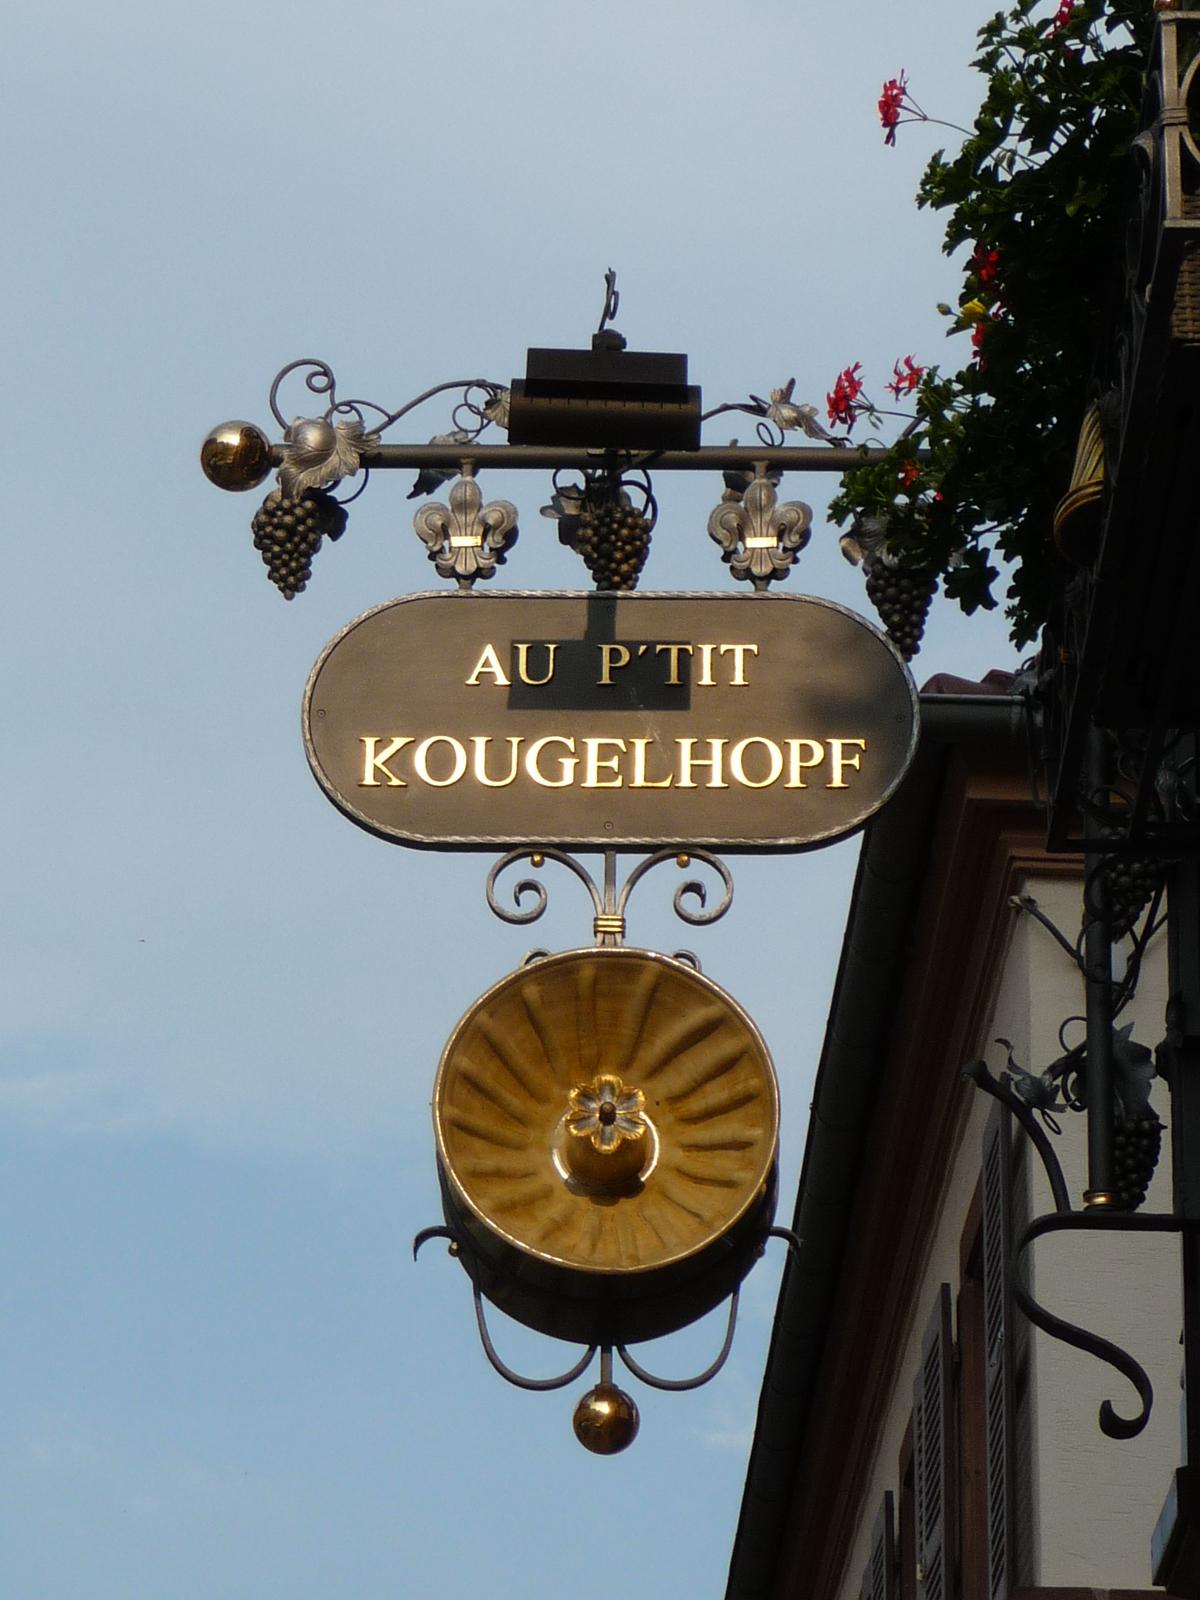 Au_petit_Kougelhopf